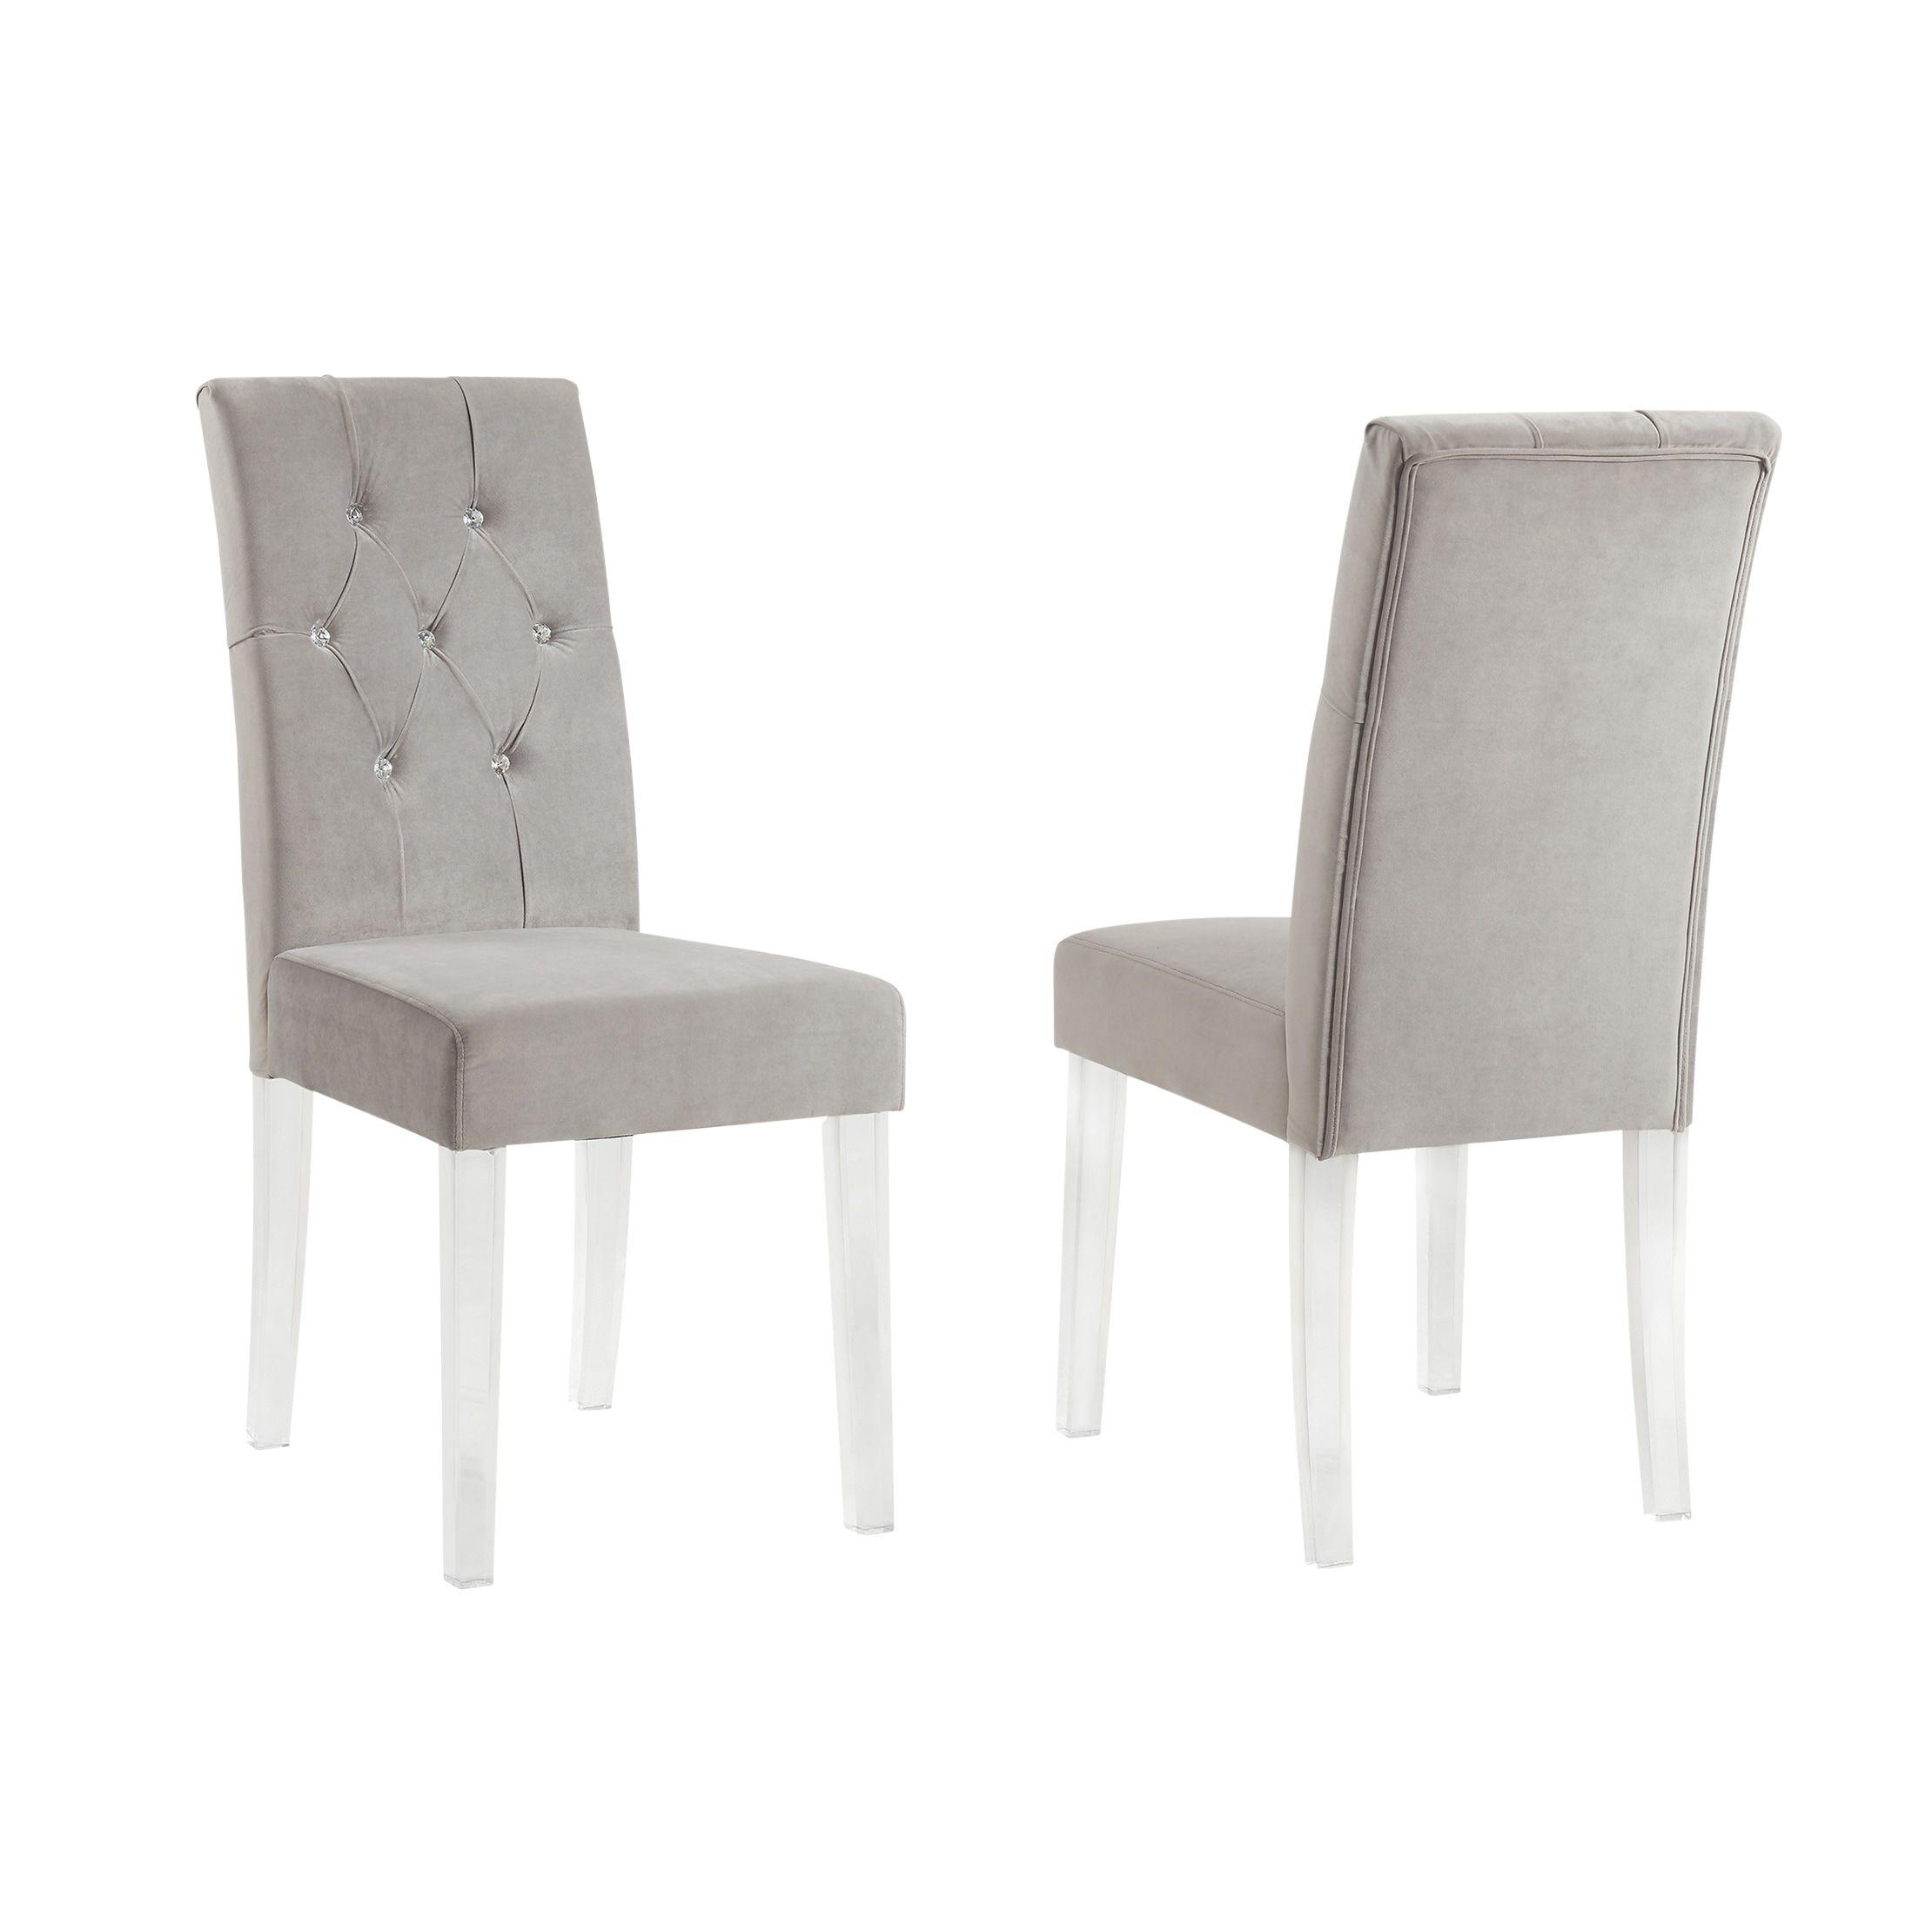 Cavalli Crystal Studded Velvet Dining Chairs With Acrylic